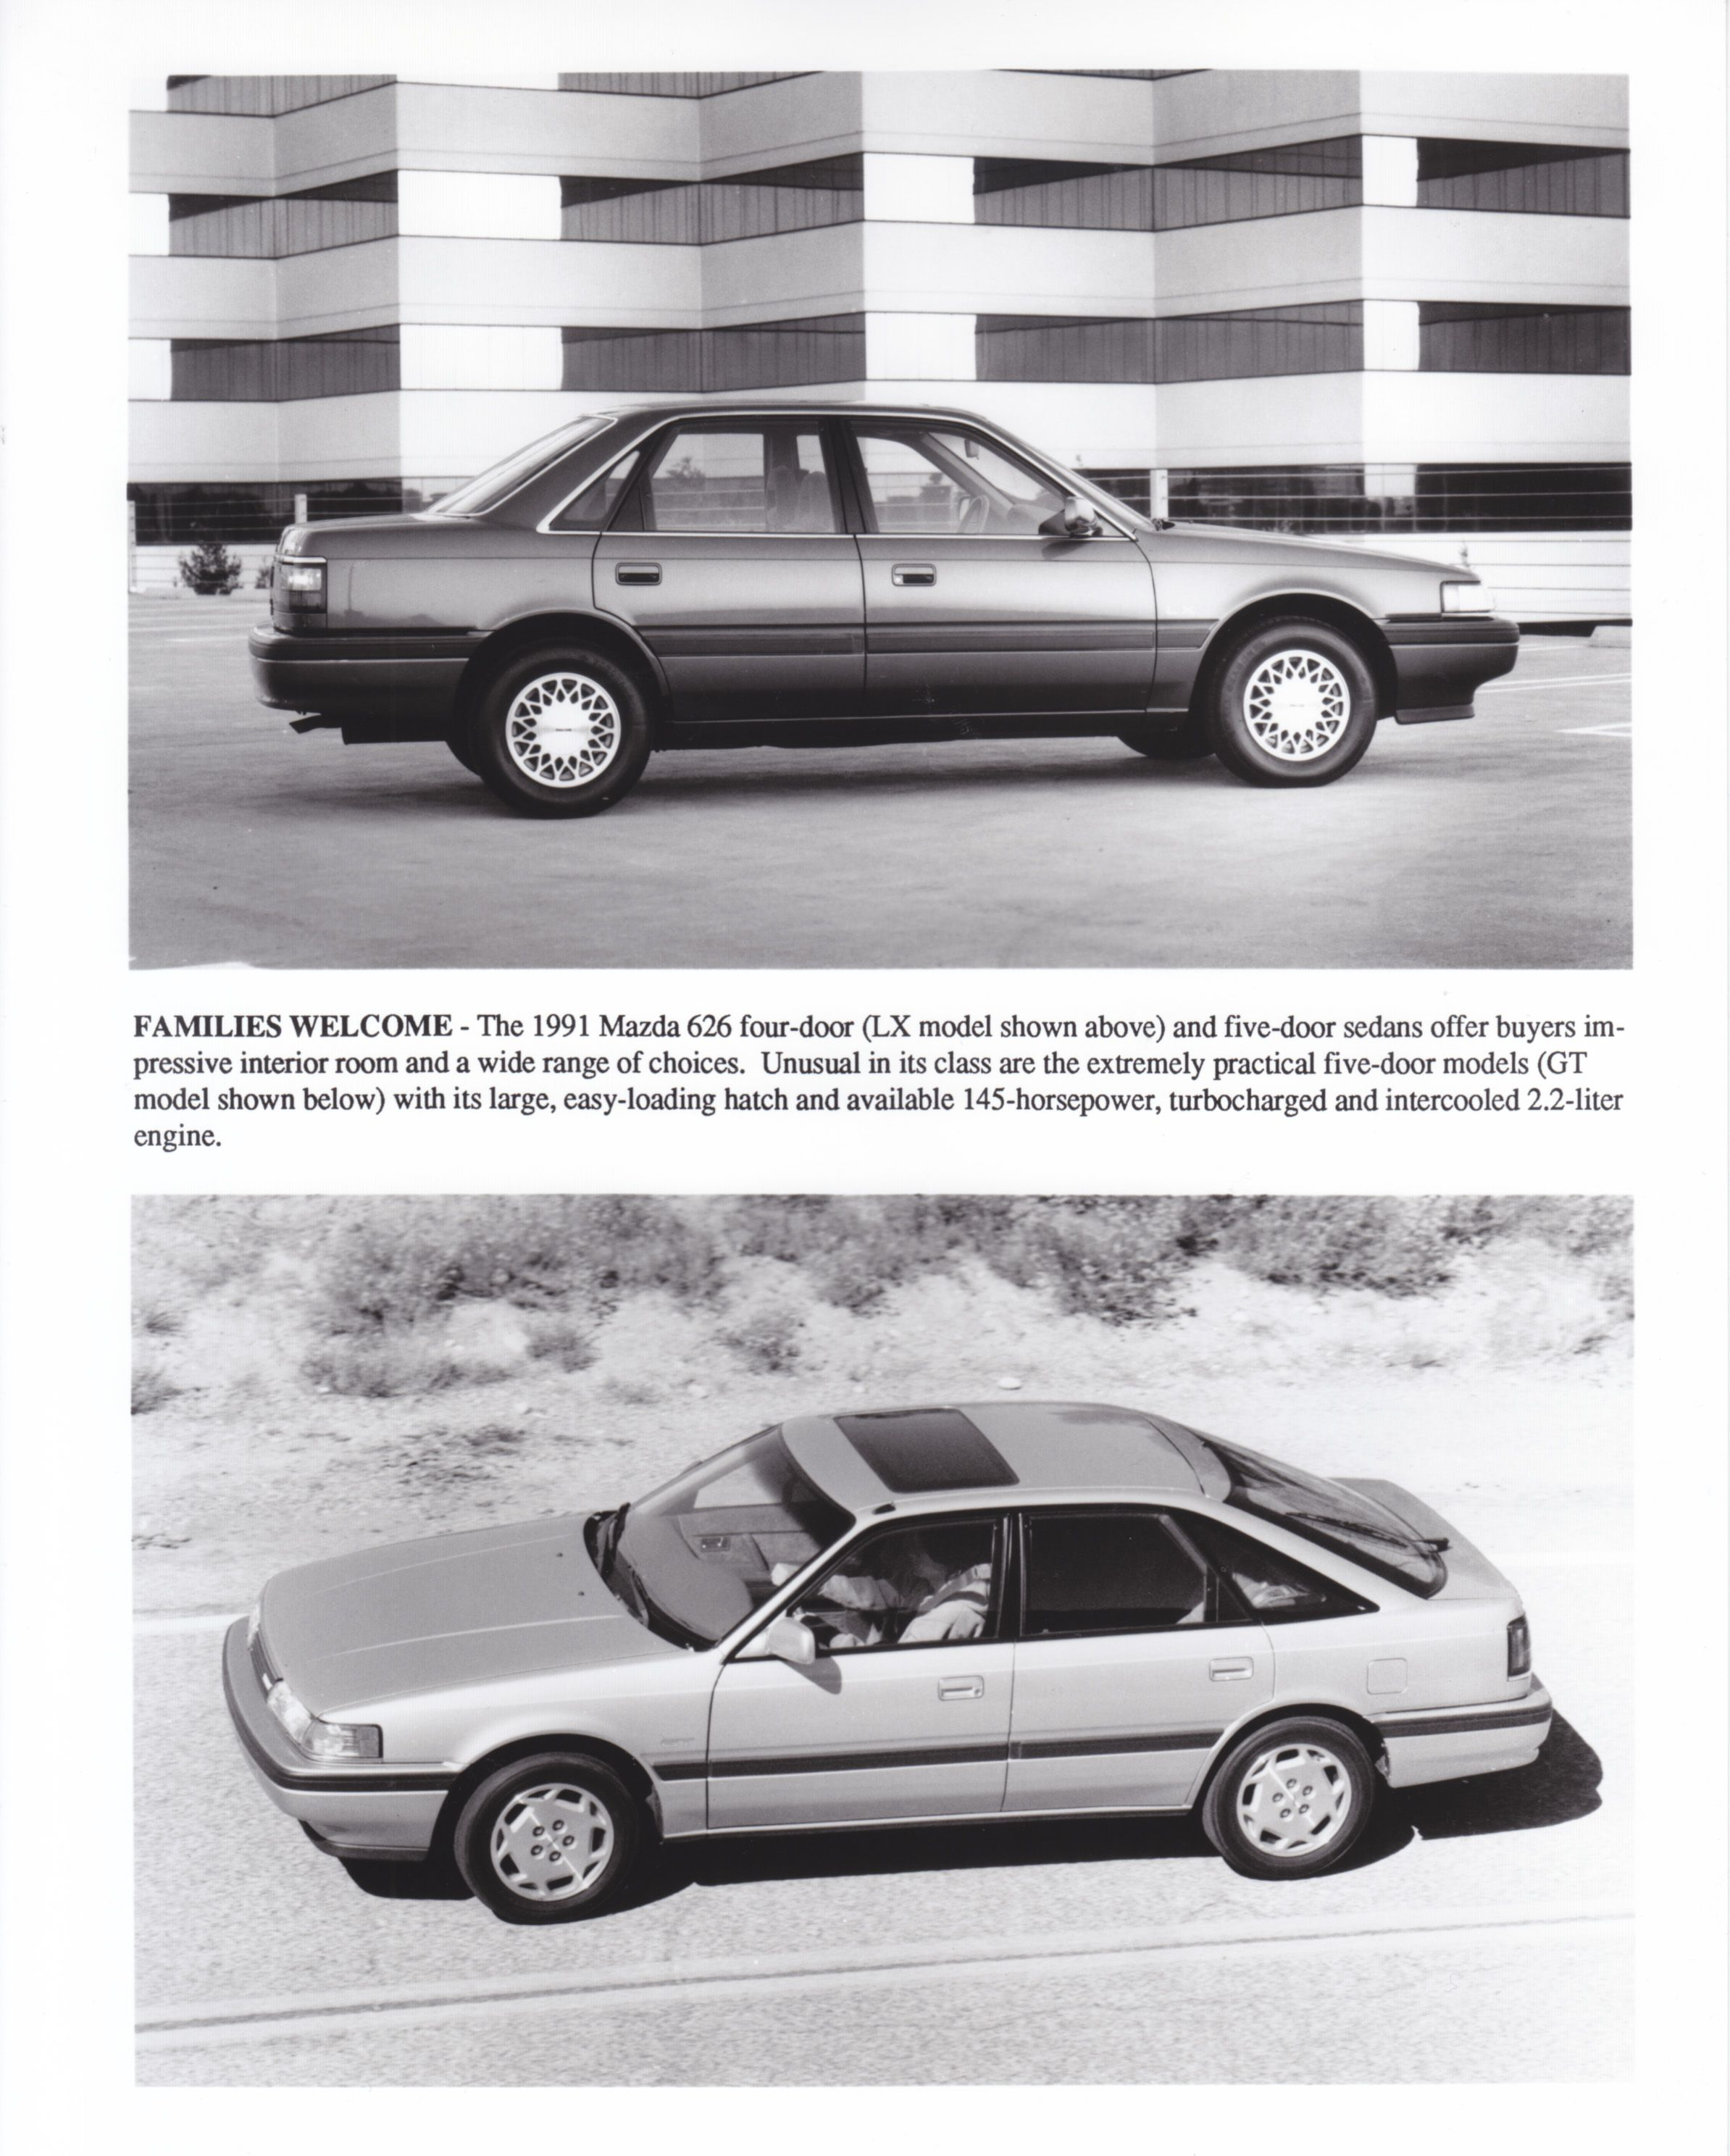 Electric Vehicle Mazda 626 4 Door Lx Gt 5 Usa 1991